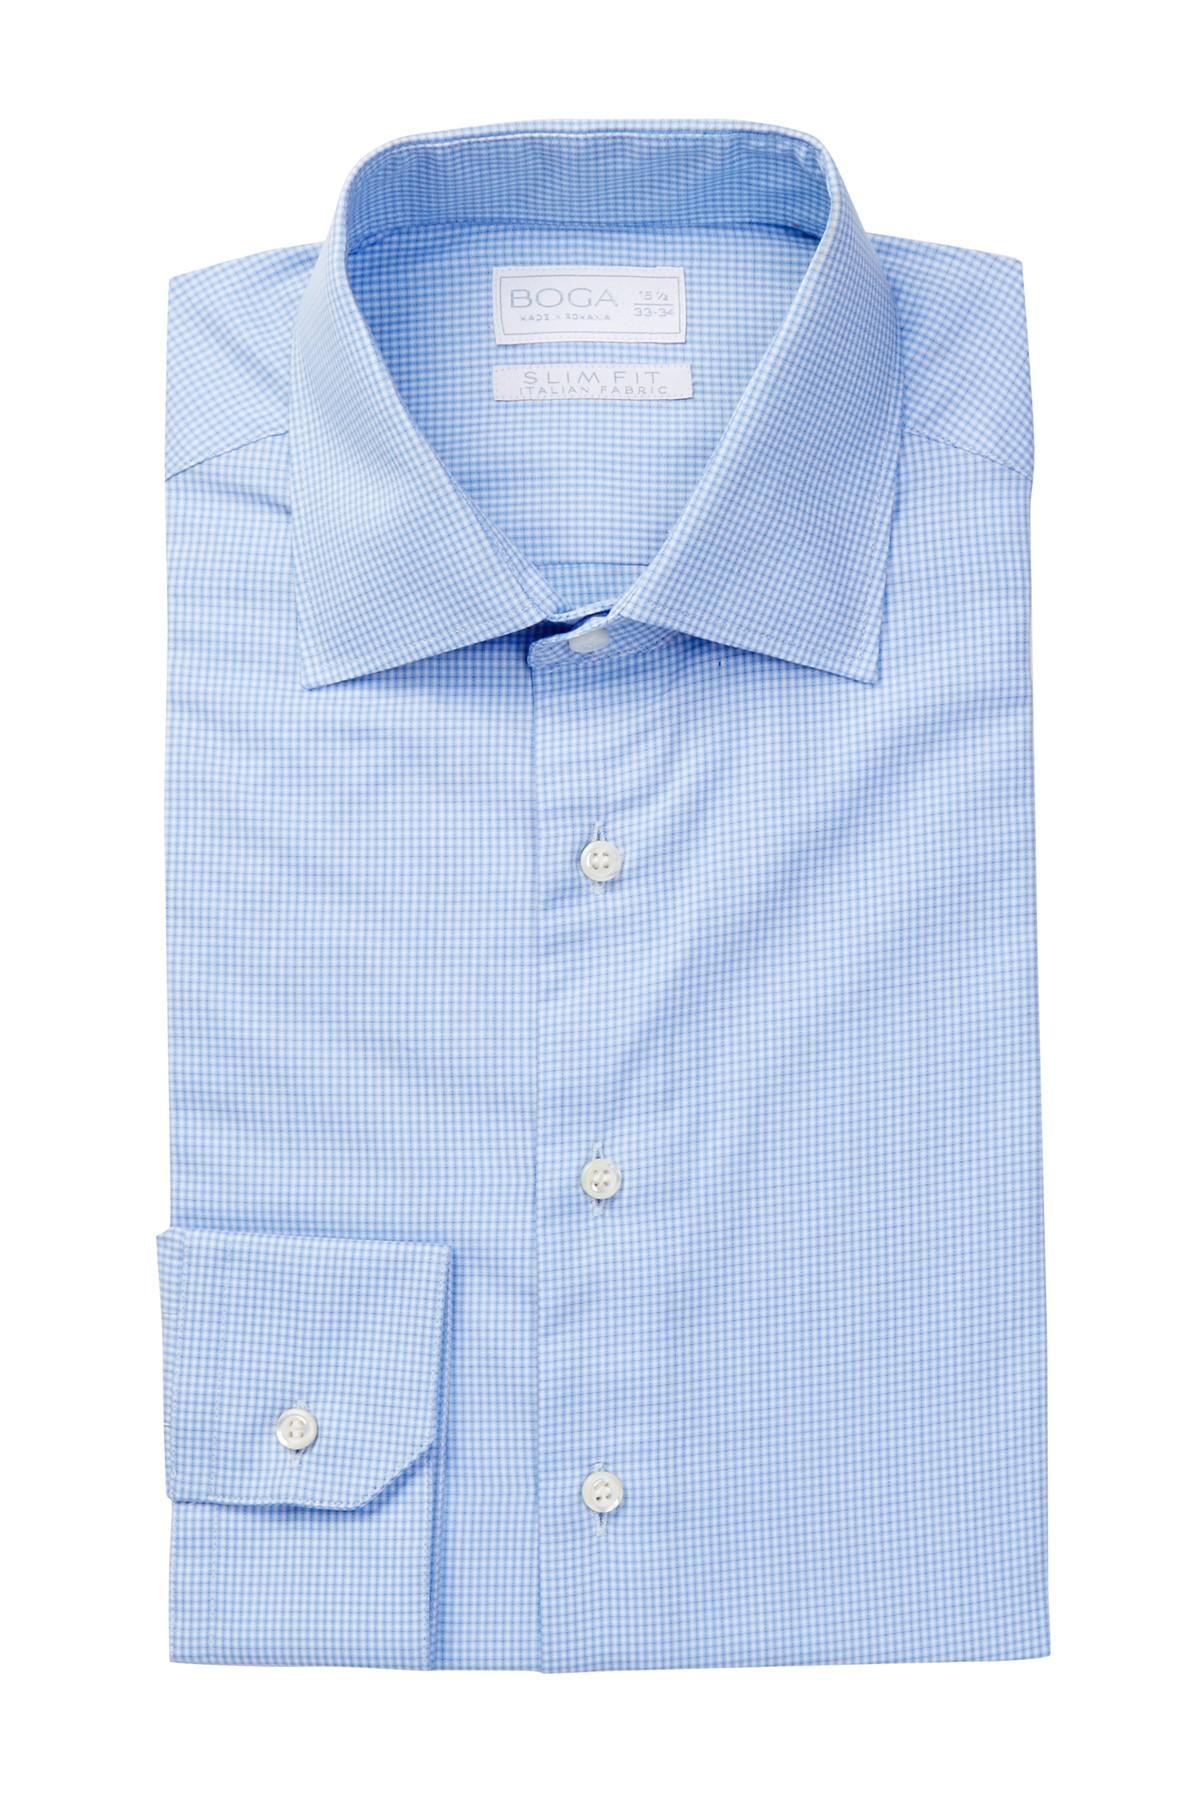 Boga long sleeve modern fit micro check dress shirt in for Modern fit dress shirt